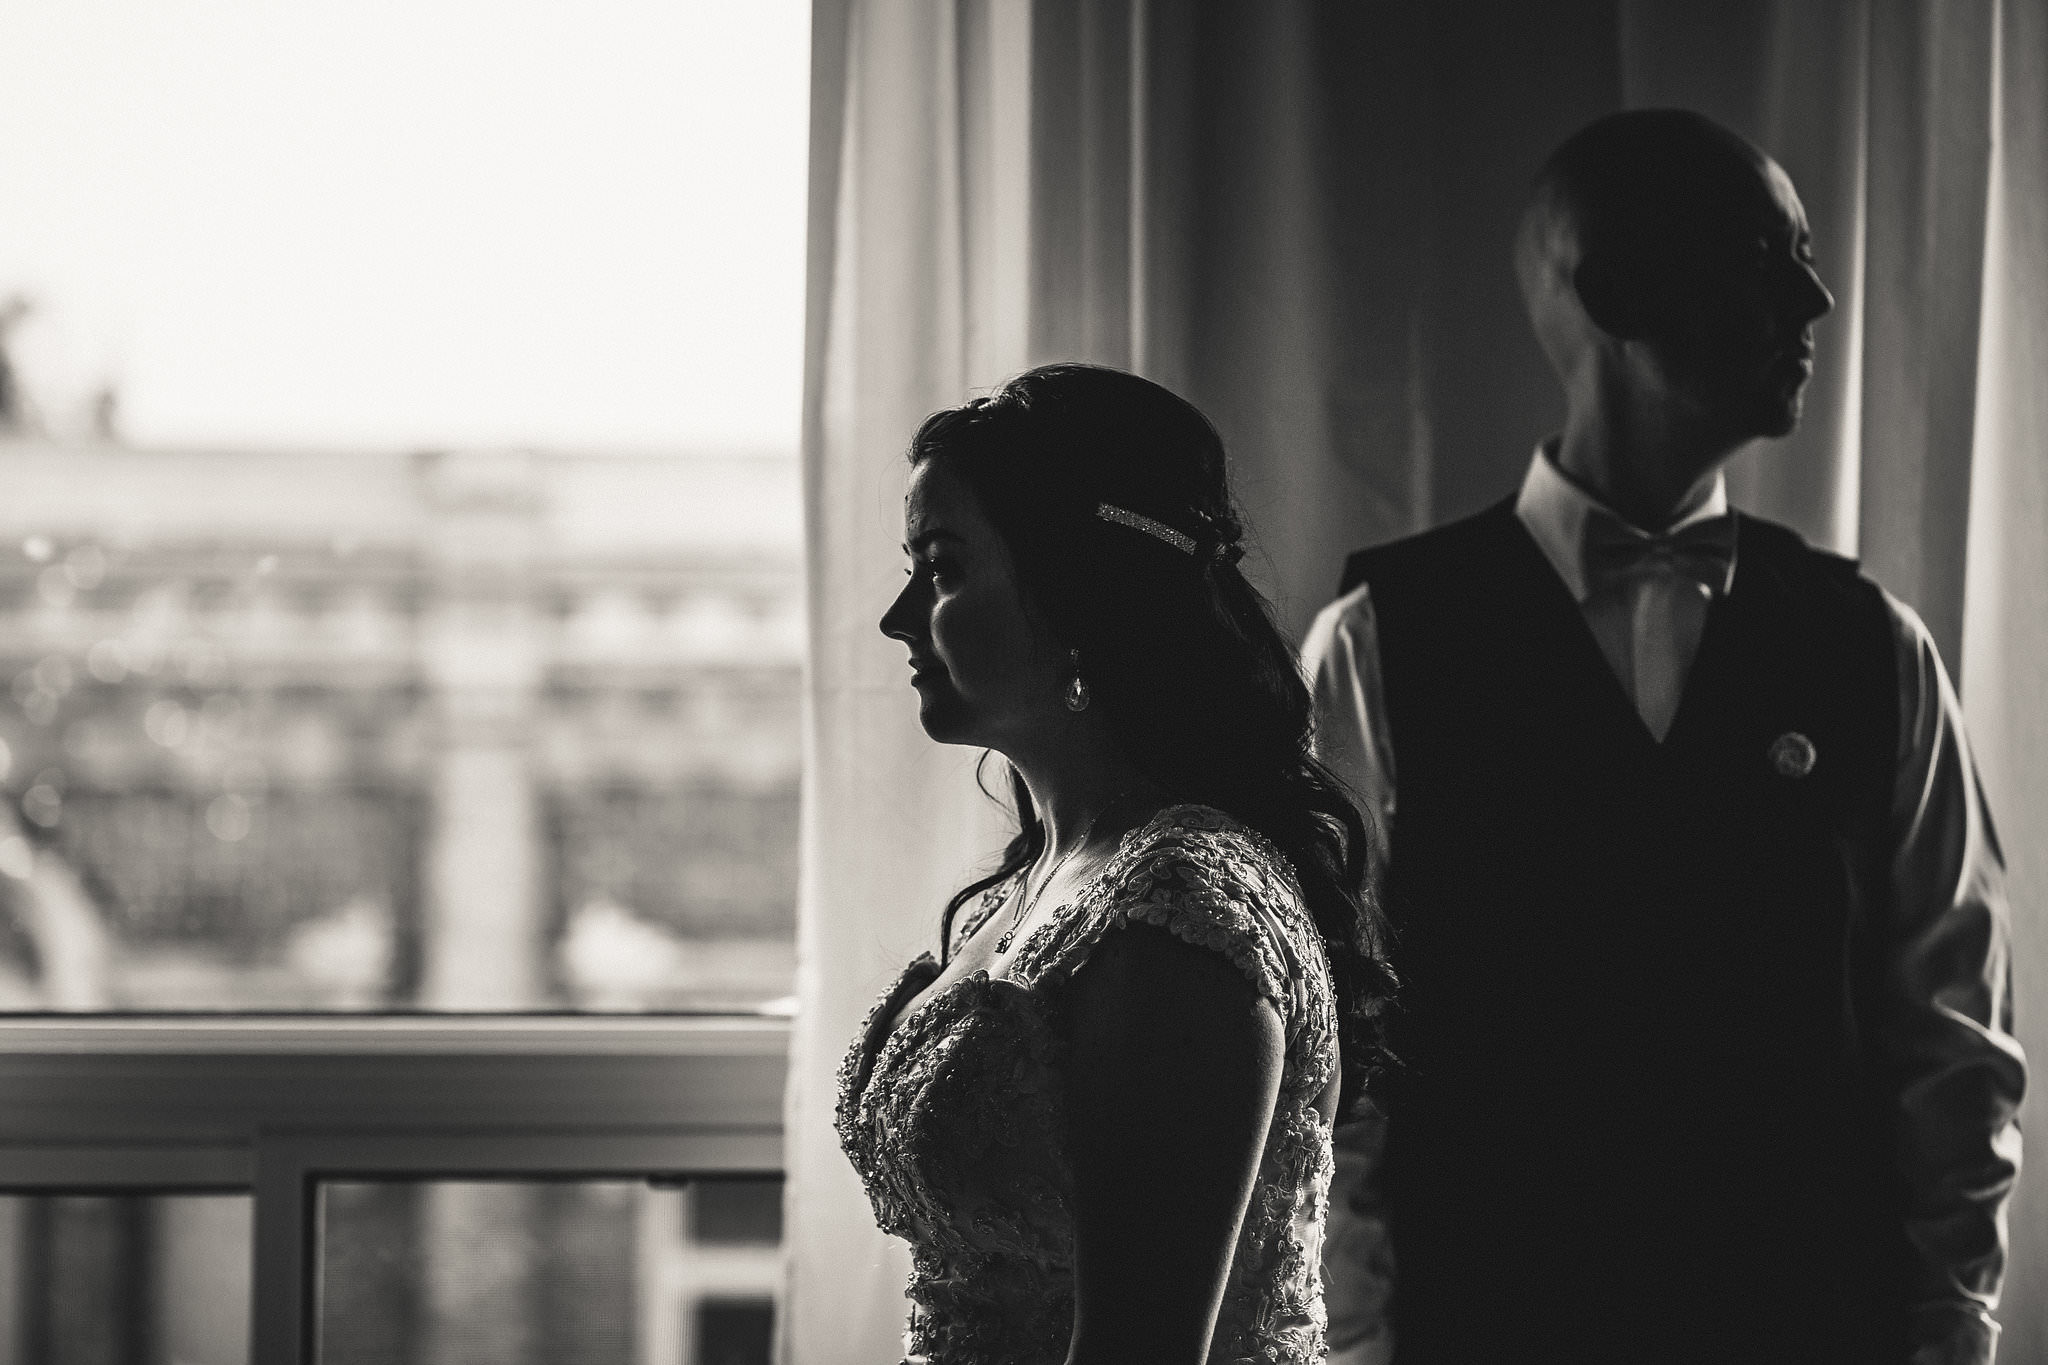 Kristen Adam Kindred Loft Whitby Wedding Photos 358 - Durham Wedding Photographer: Kindred Loft Wedding Photos